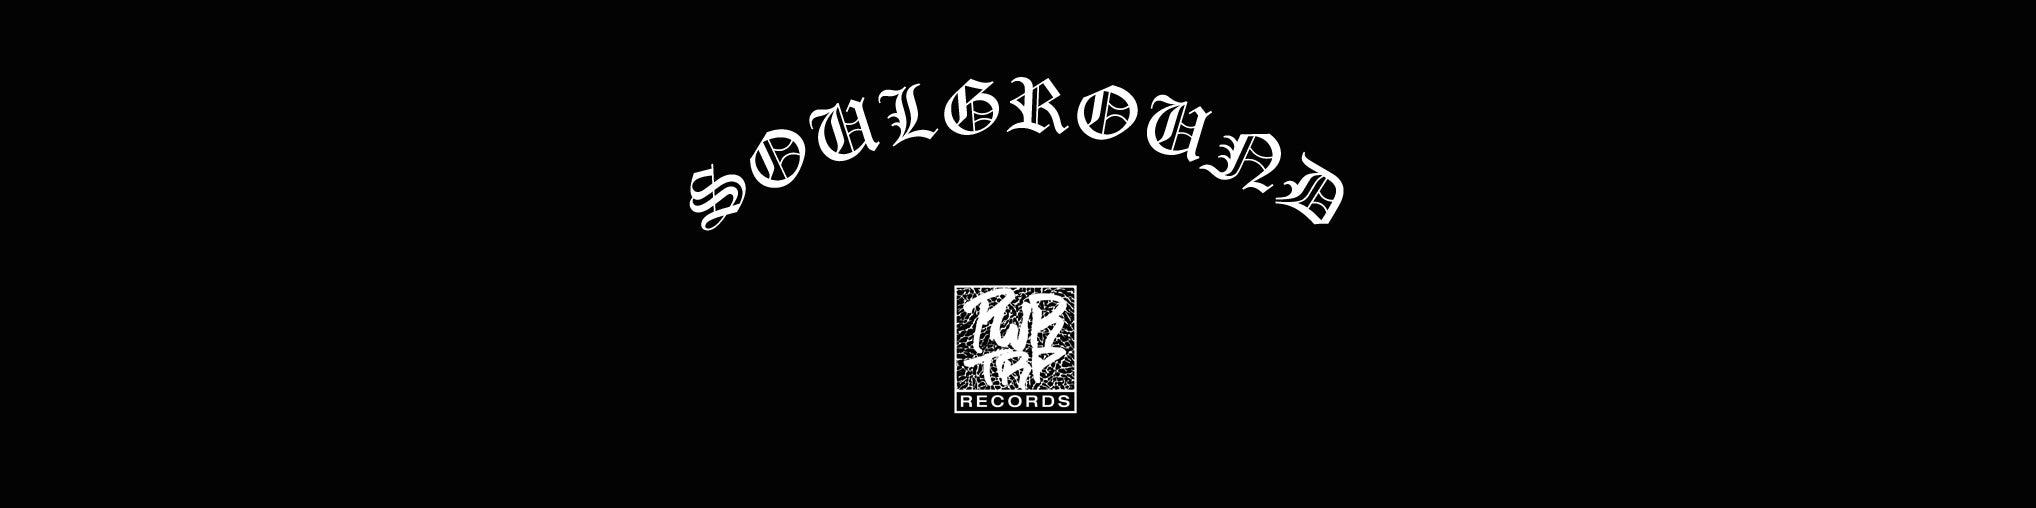 SOULGROUND store